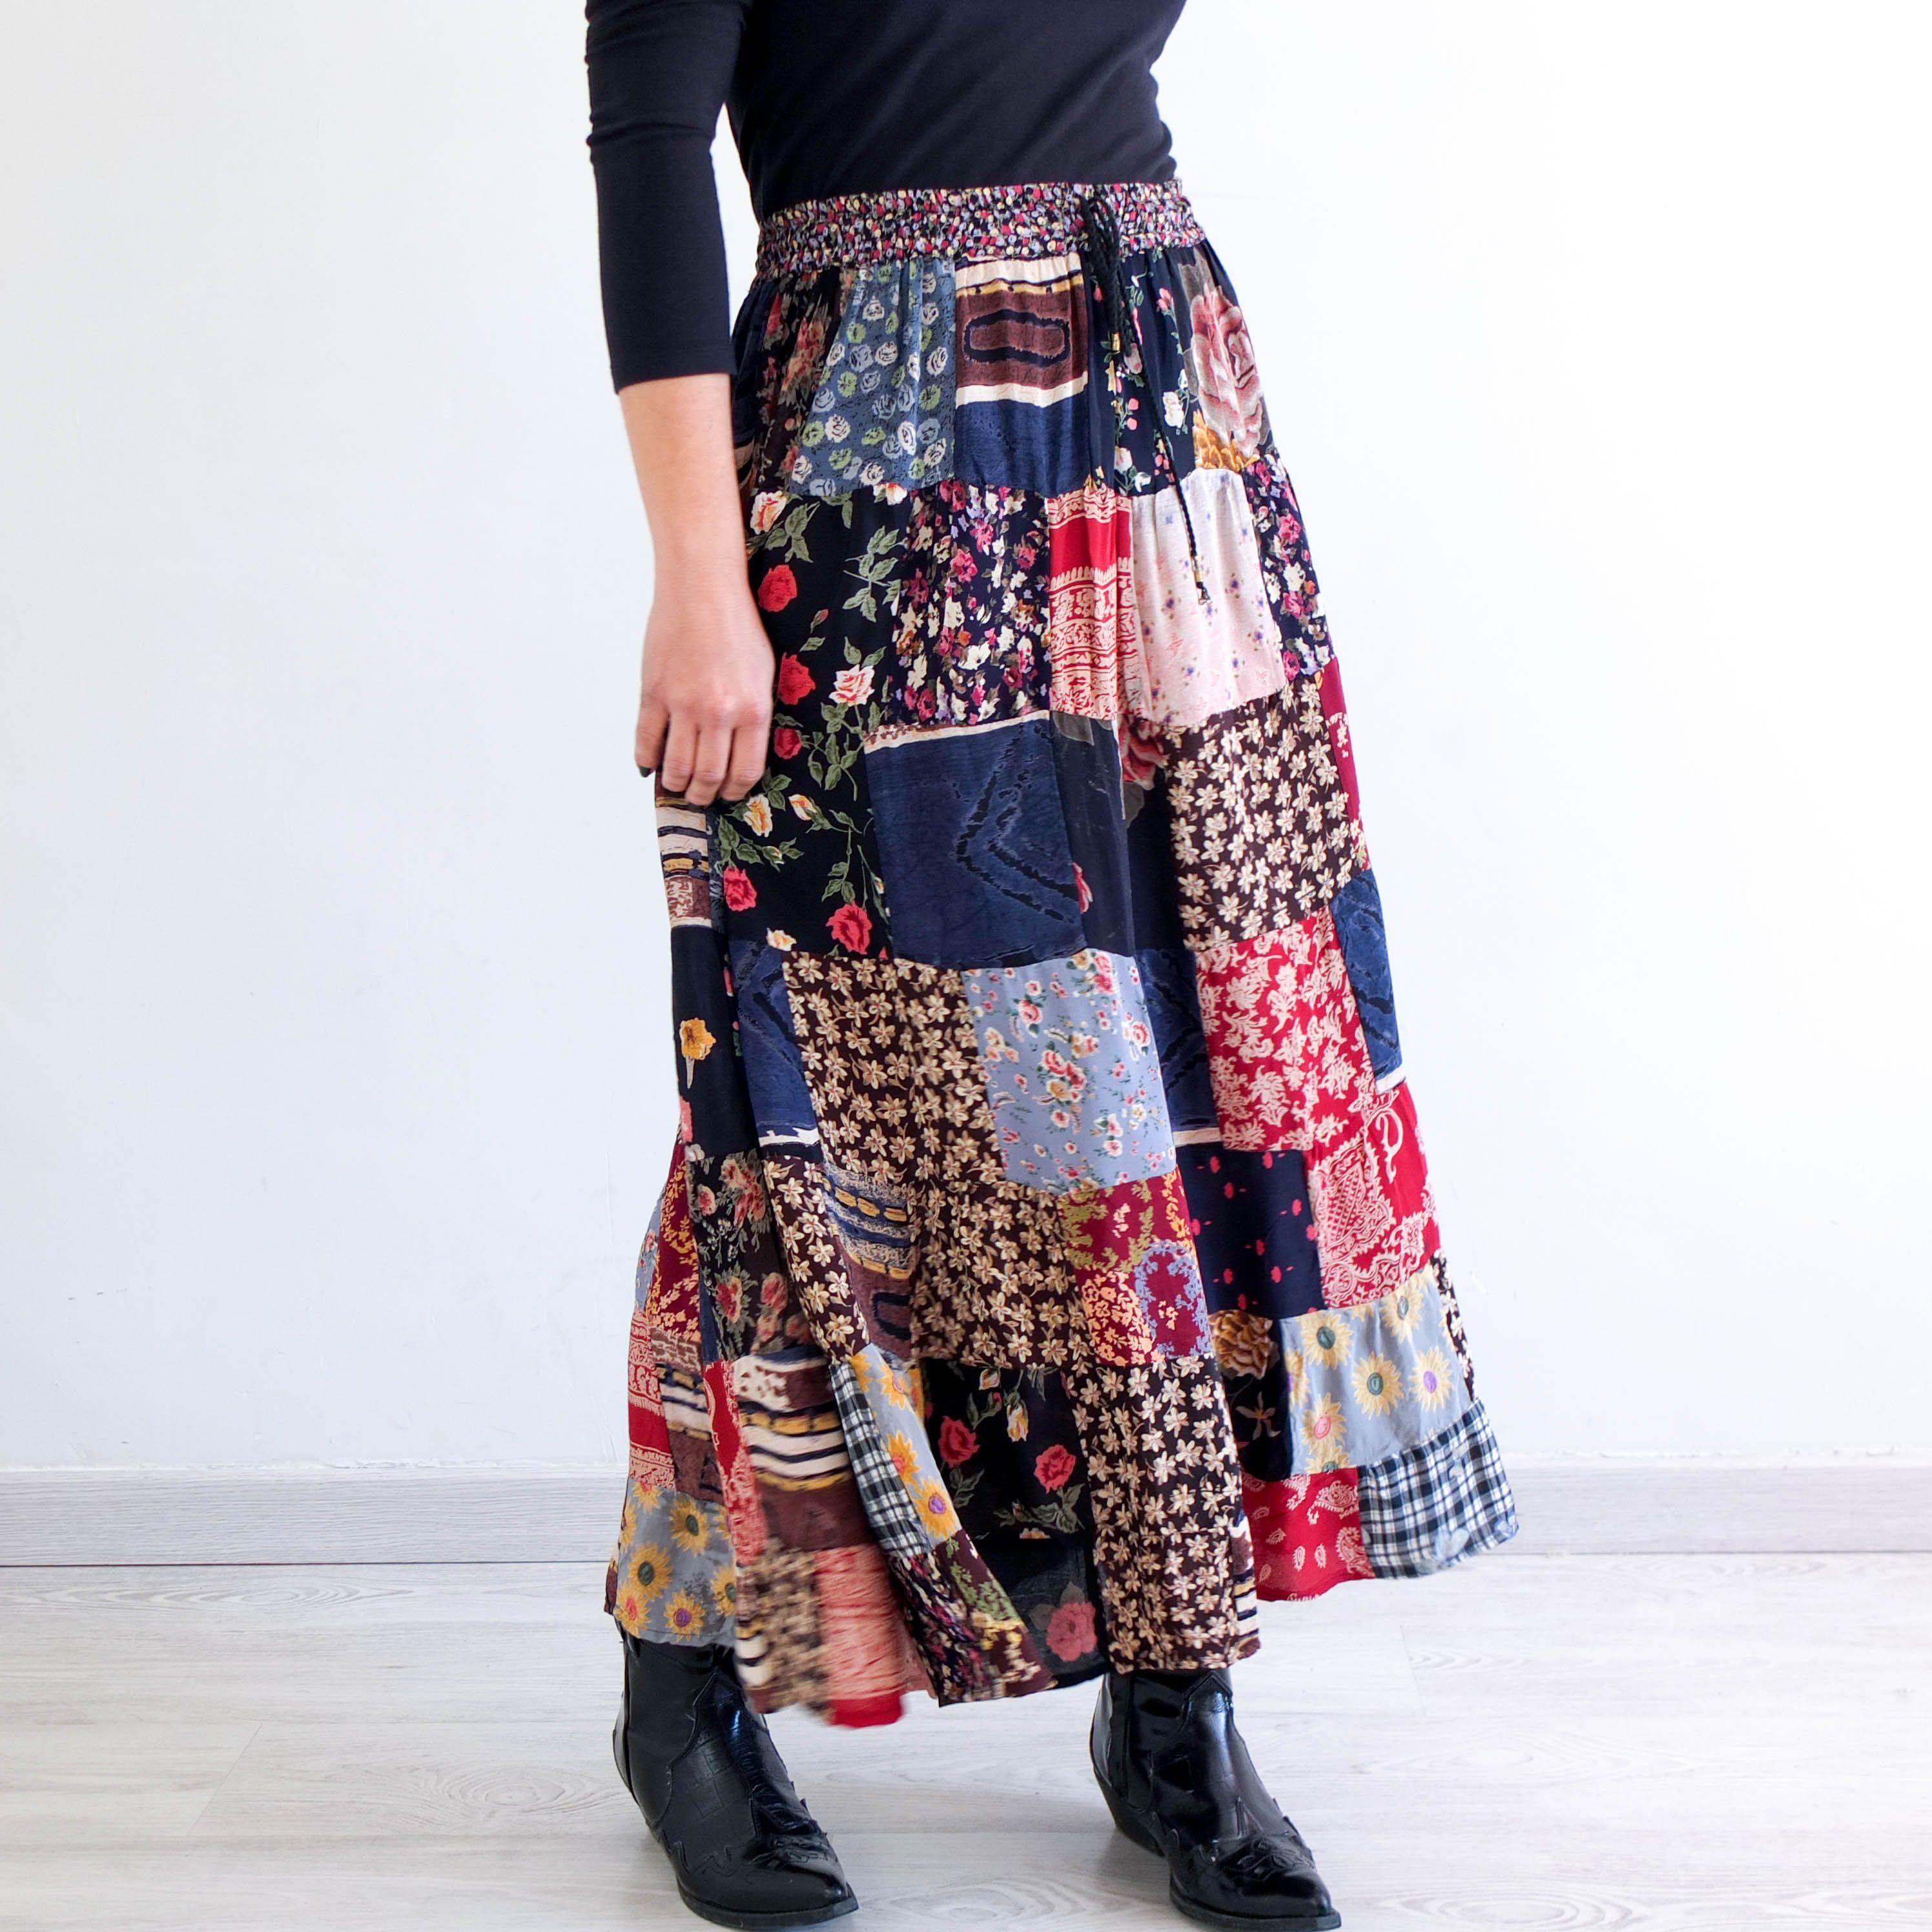 size S Fantasy kawaii long skirt rainbow pastel candy midi skirt Vintage 60s 70s psychedelic skirt